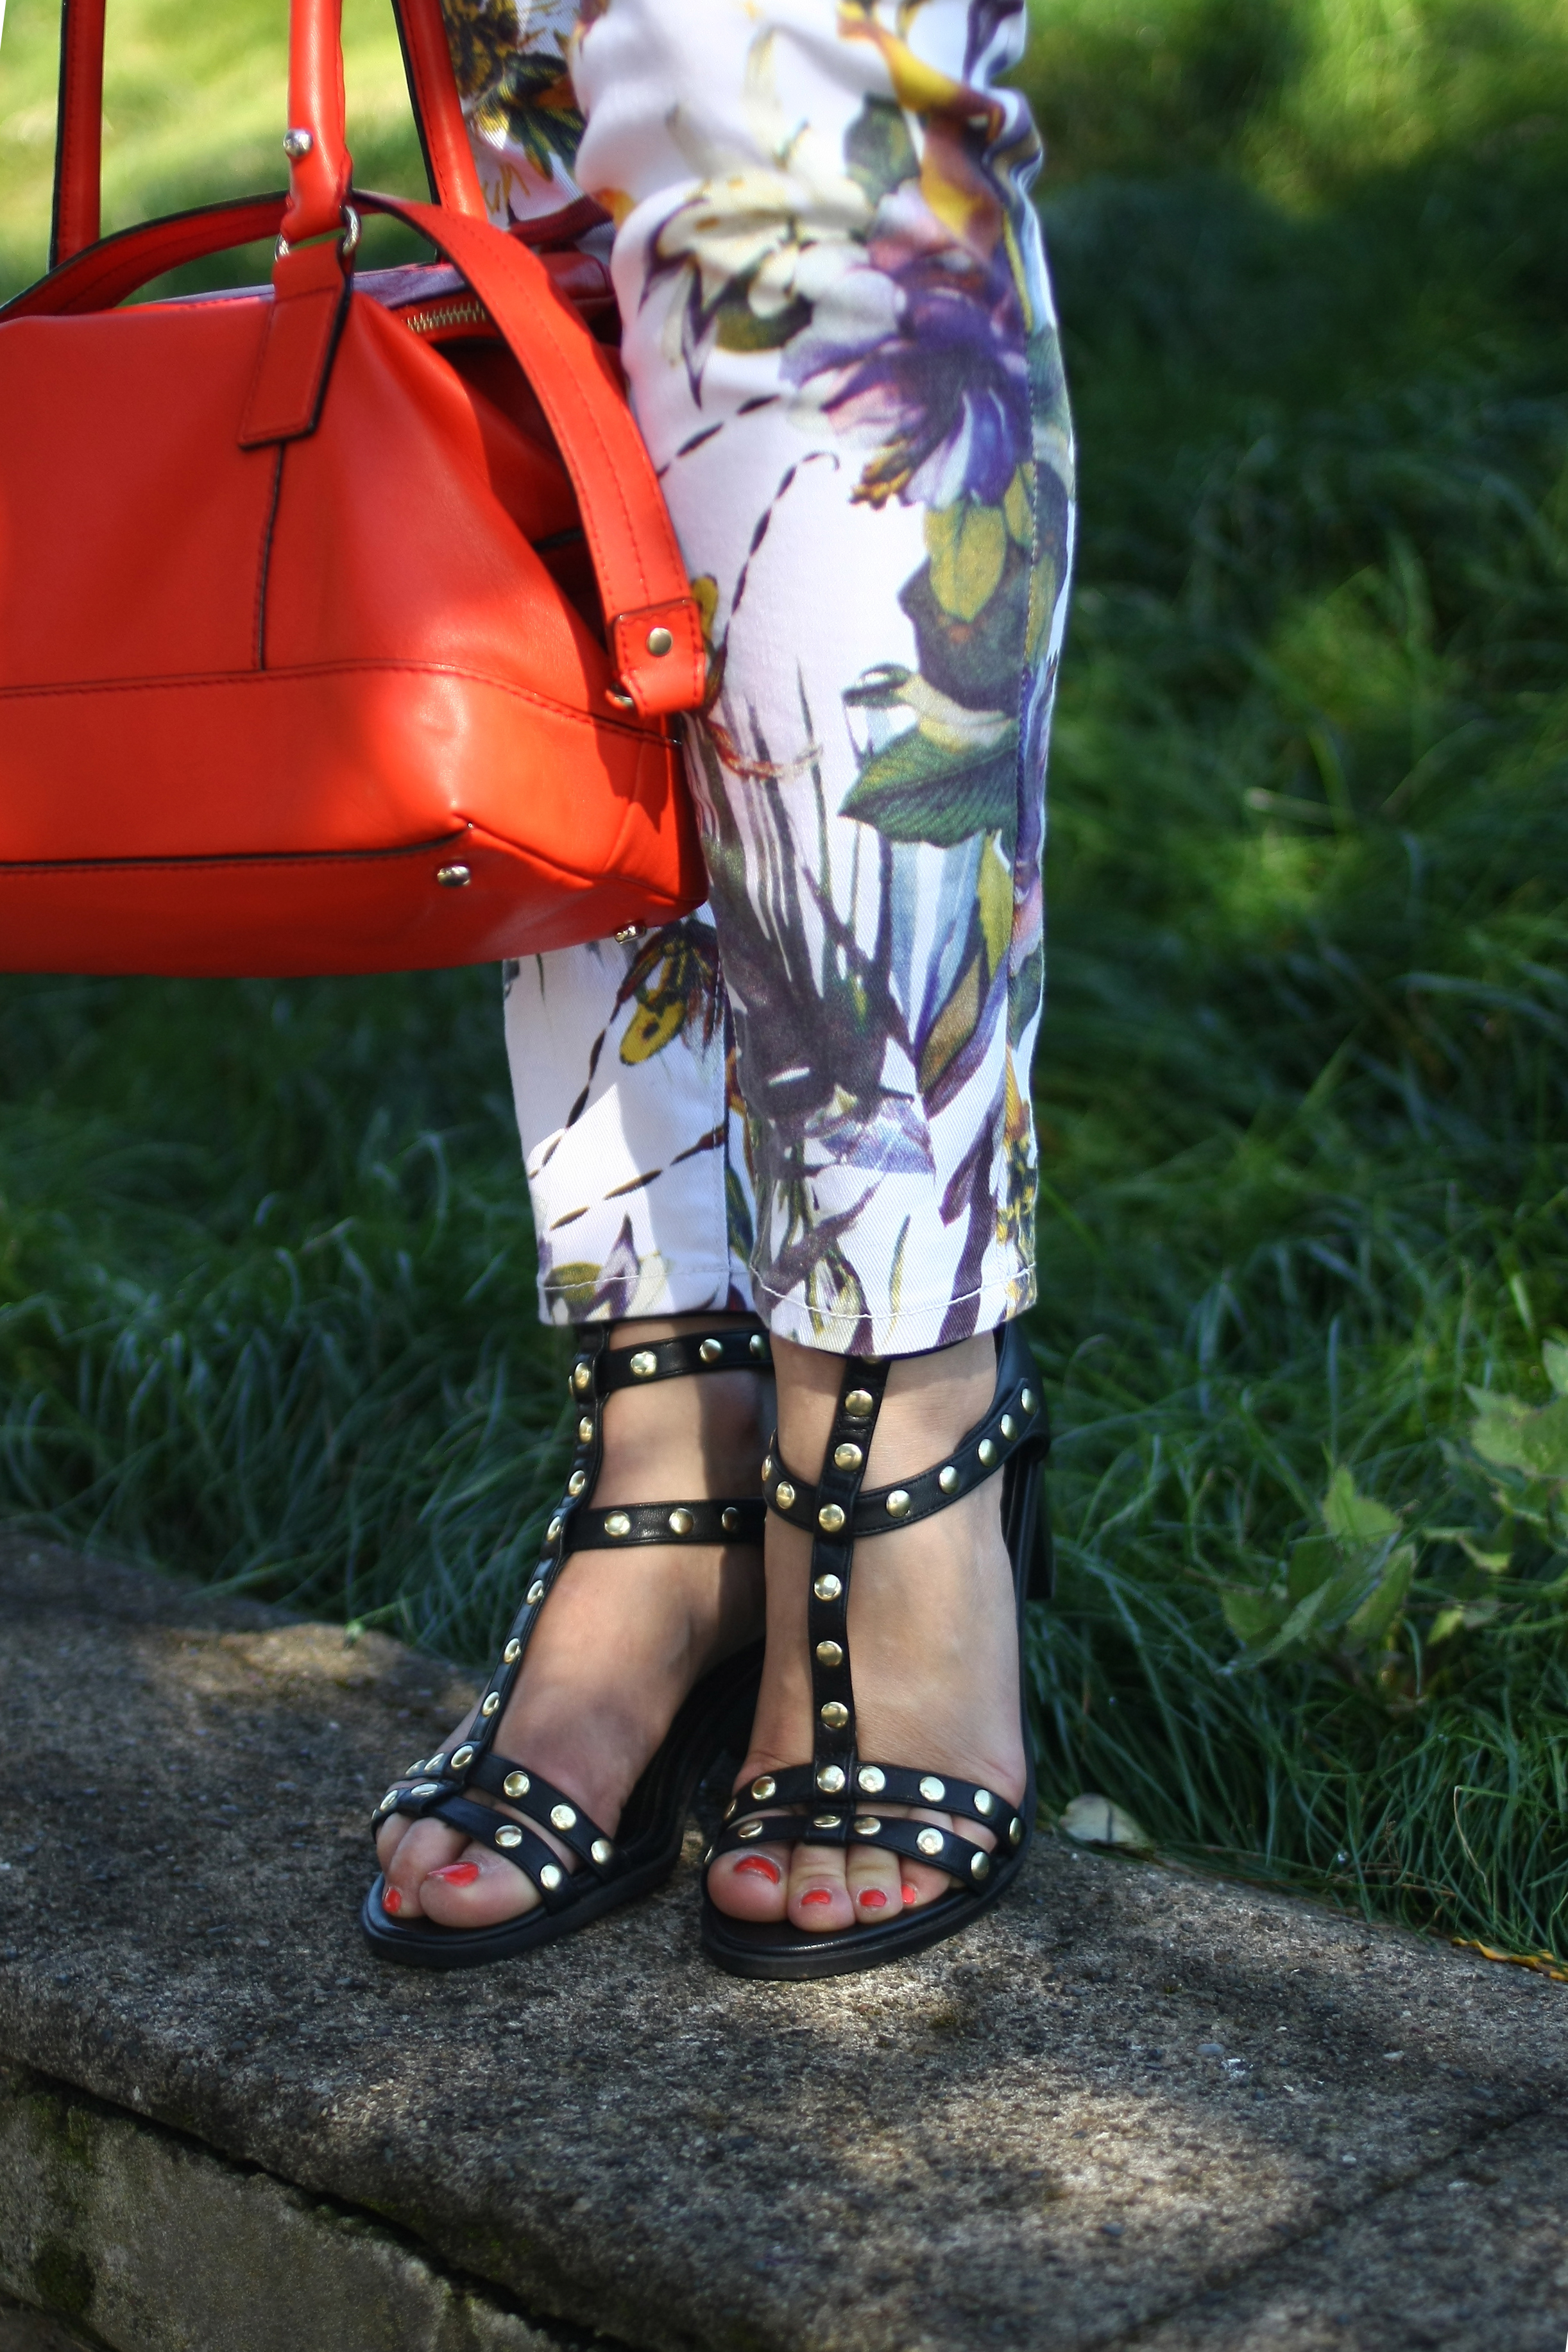 Shirt: JCrew | Denim: F21 | Pants: iBuffalo via Crossroads (similar here) | Shoes: H&M | Purse: Kate Spade